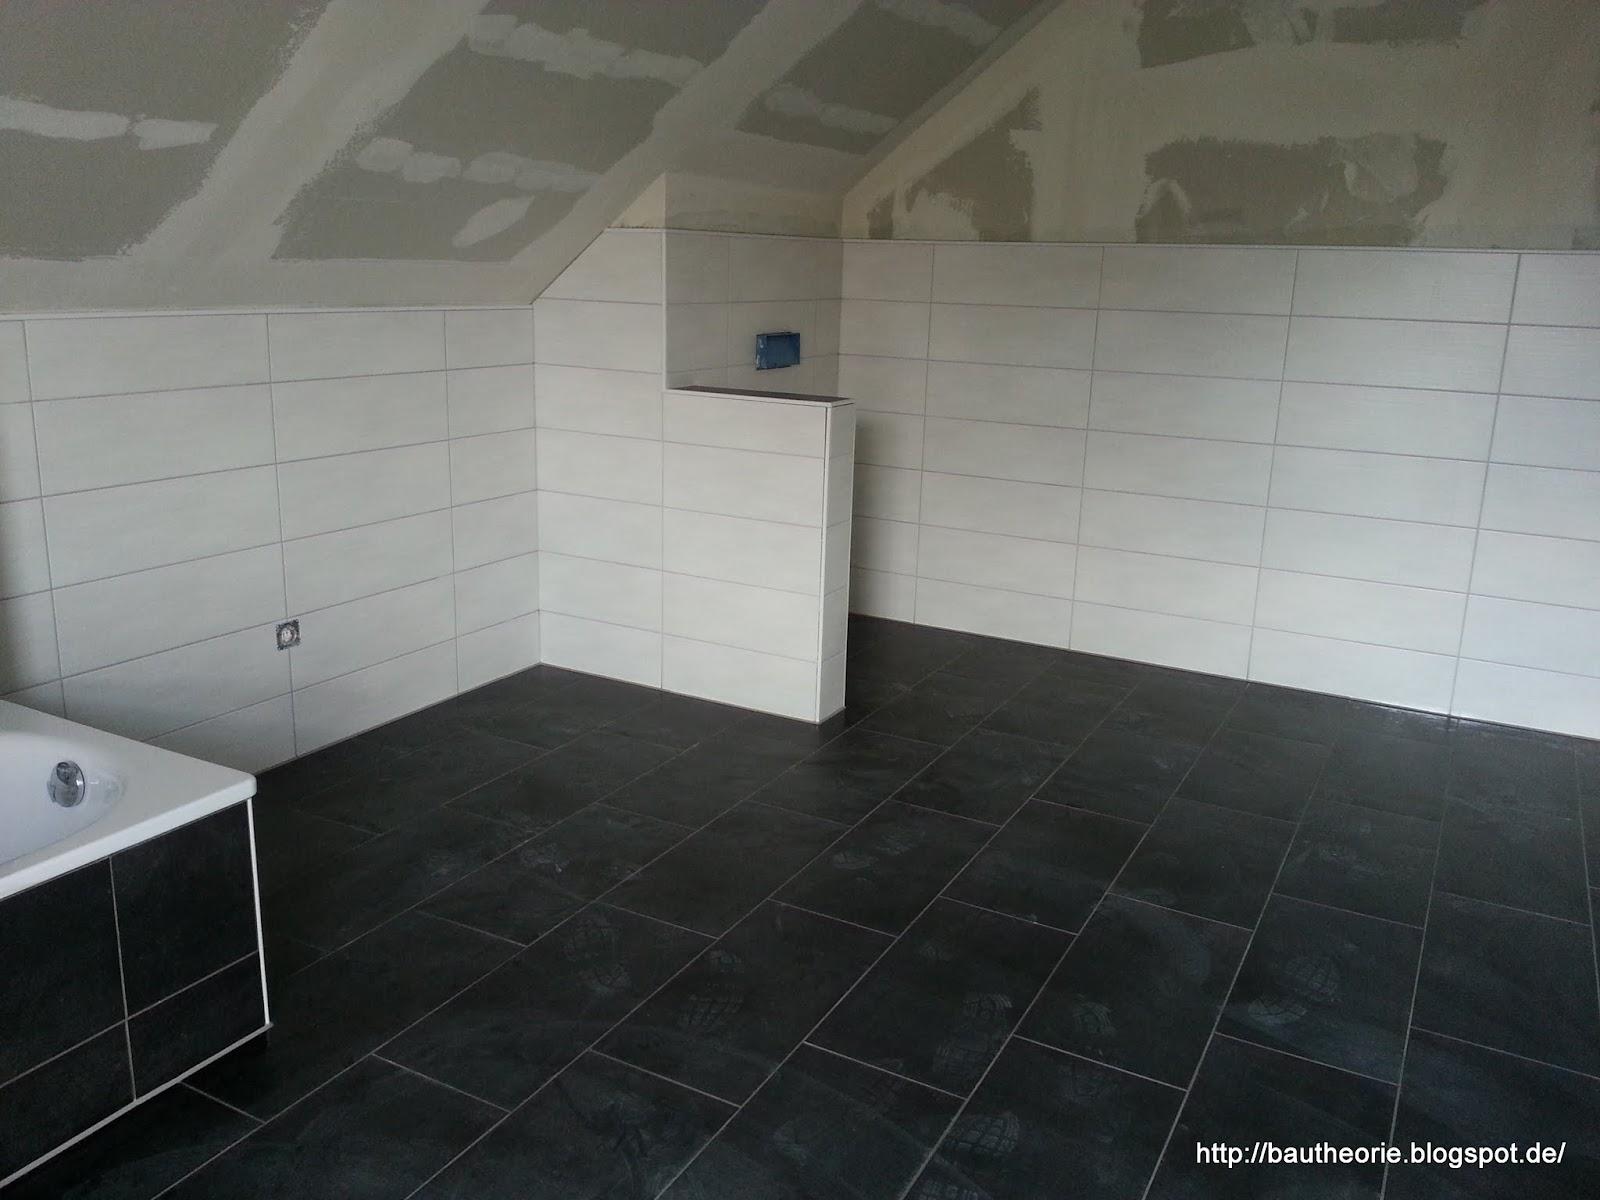 theoretisch h mmer s druff juli 2015. Black Bedroom Furniture Sets. Home Design Ideas